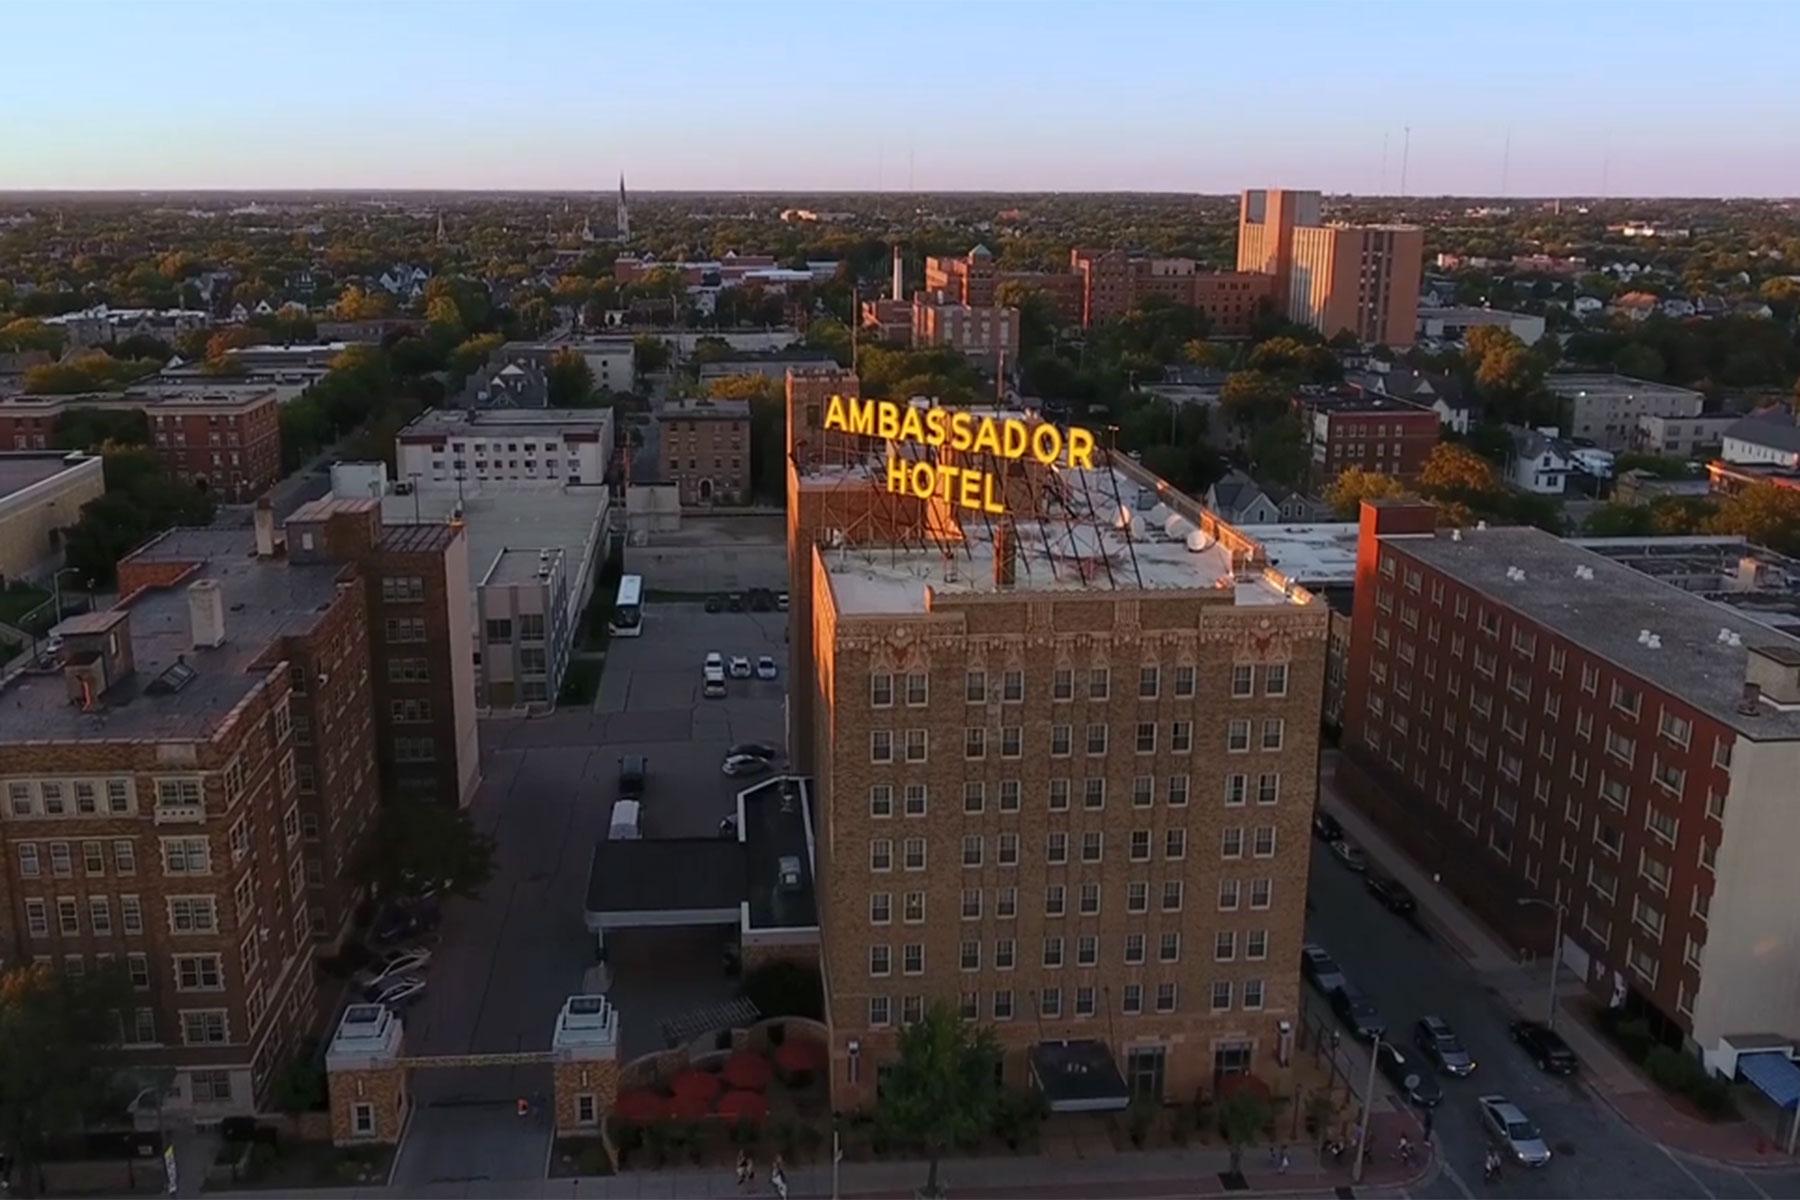 ambassadorhotelview_01